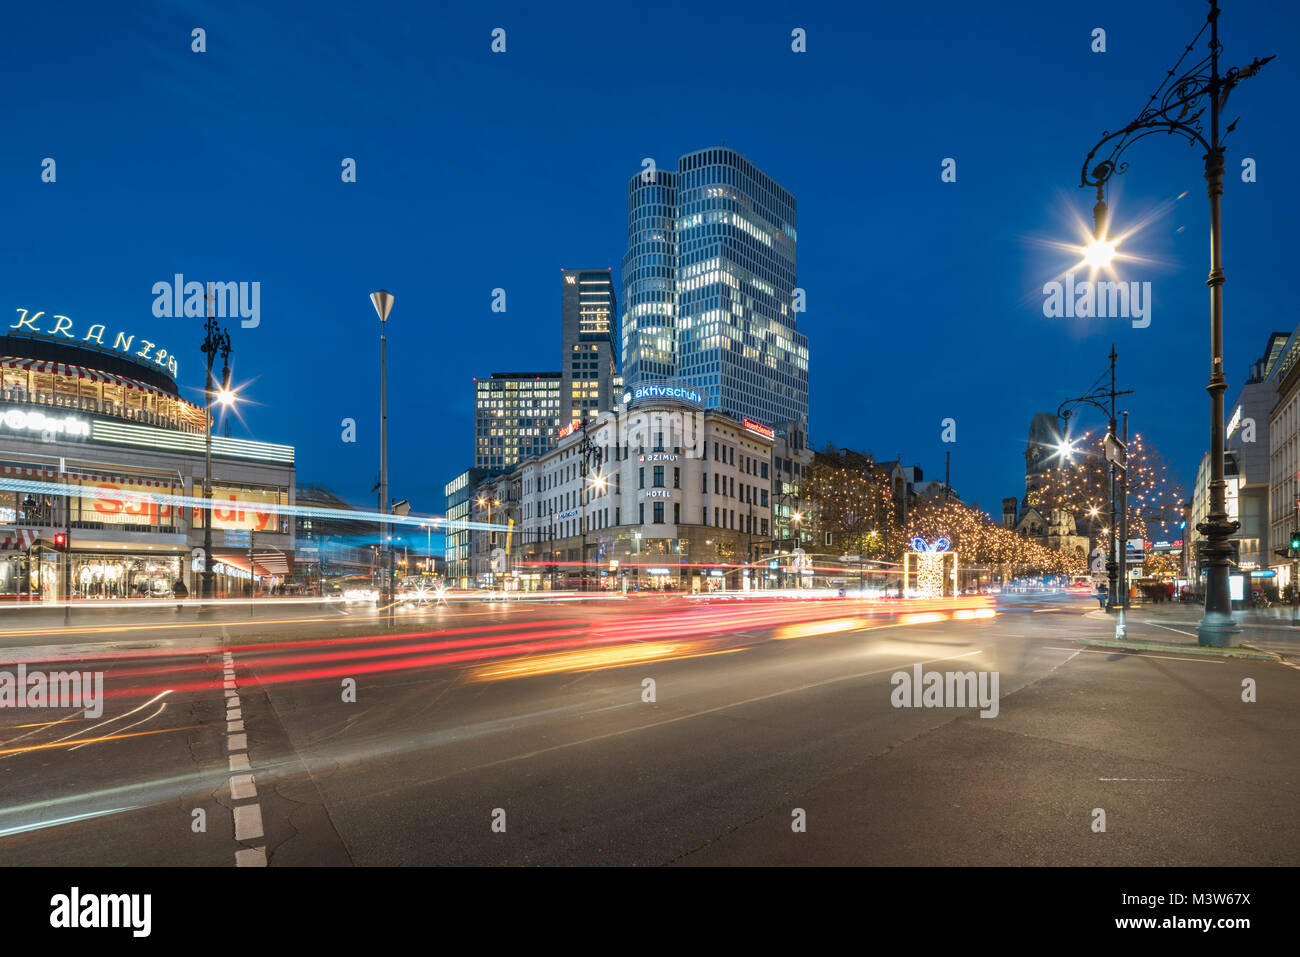 Christmas illumination, Kurfuerstendamm, Kuhdamm, Cafe Kranzler, Upper West Tower, Waldorf Astoria, Berlin - Stock Image